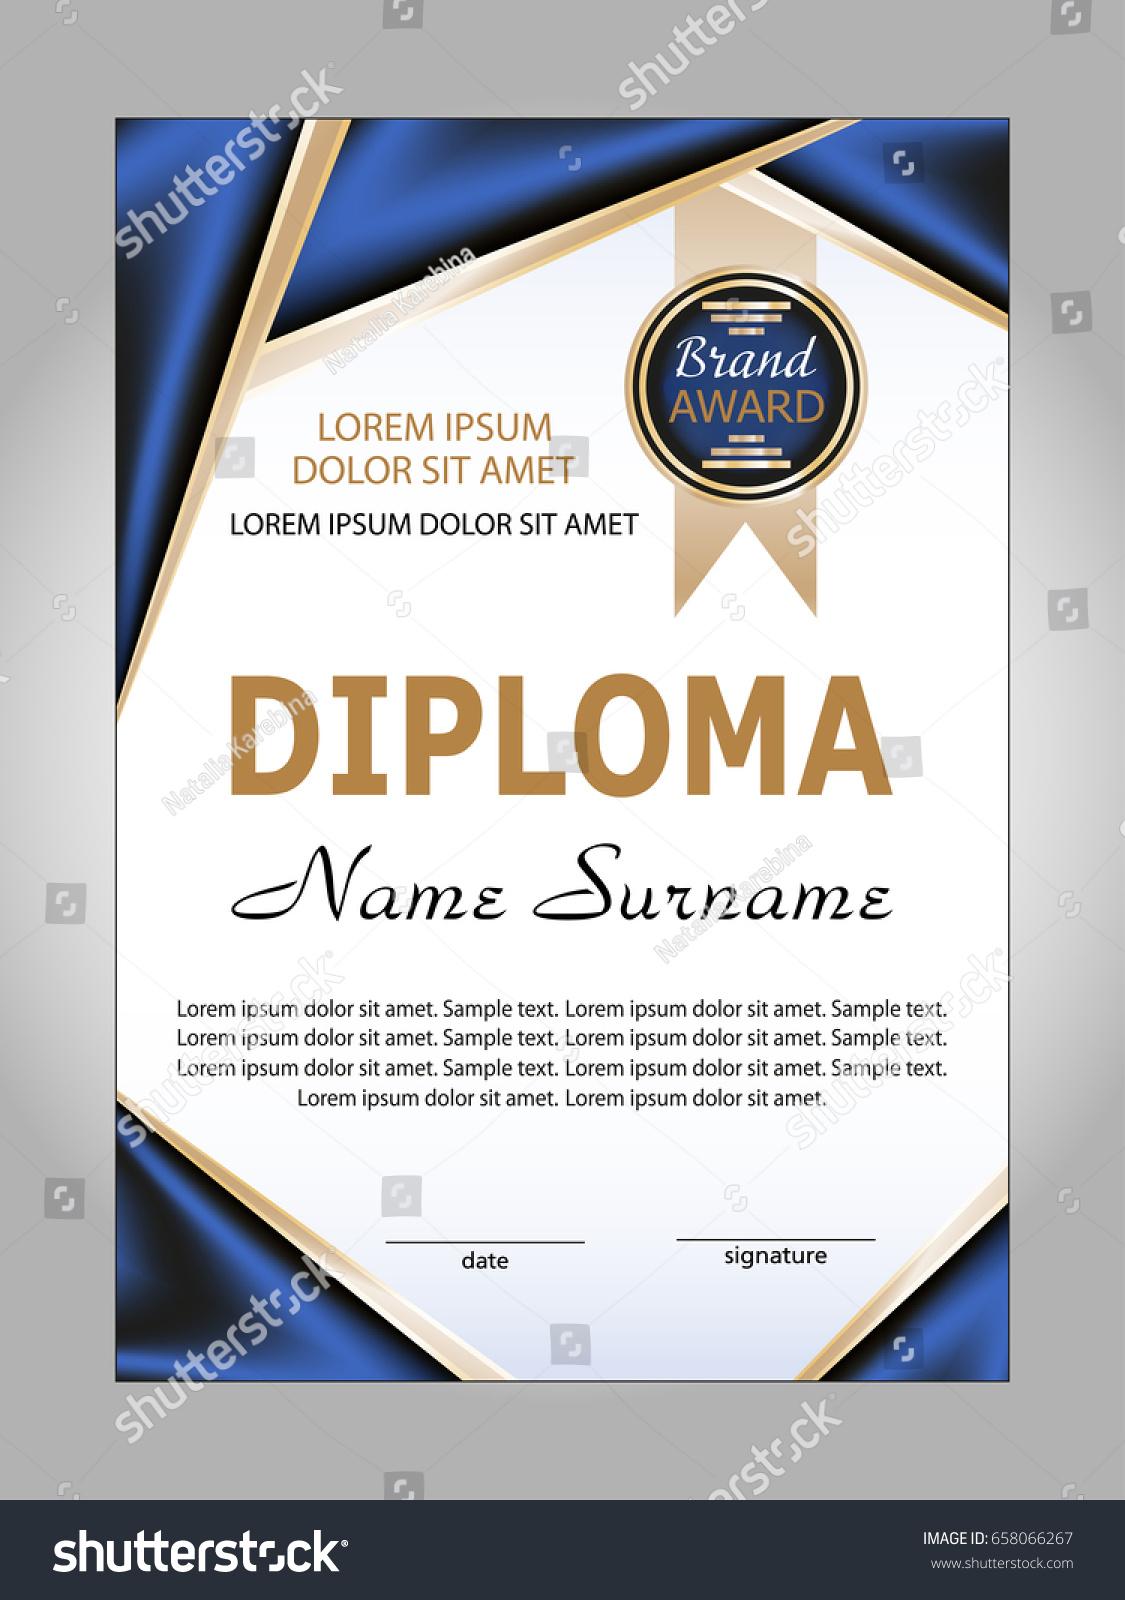 Template diploma certificate winning competition reward stock template diploma or certificate winning the competition reward vector illustration yelopaper Choice Image